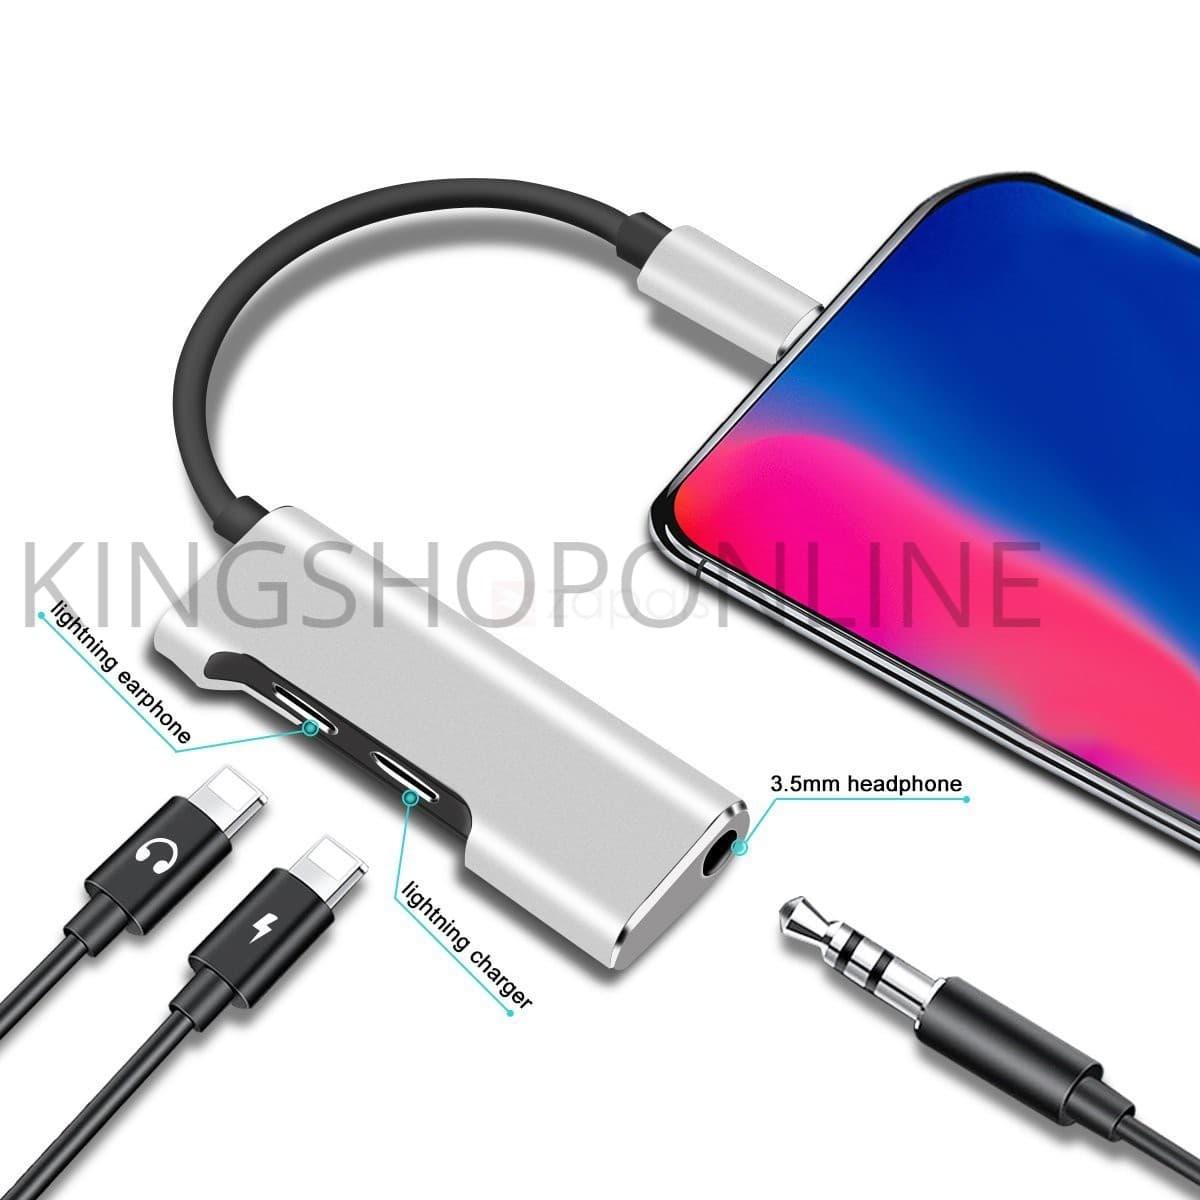 Jual New Android 71 Nougat Tv Box X96 Mini Ram 1g Rom 8g Kotak P3k Veta Mobil 3in1 Audio Cable Converter Lightning Male To 35mm Ip Female